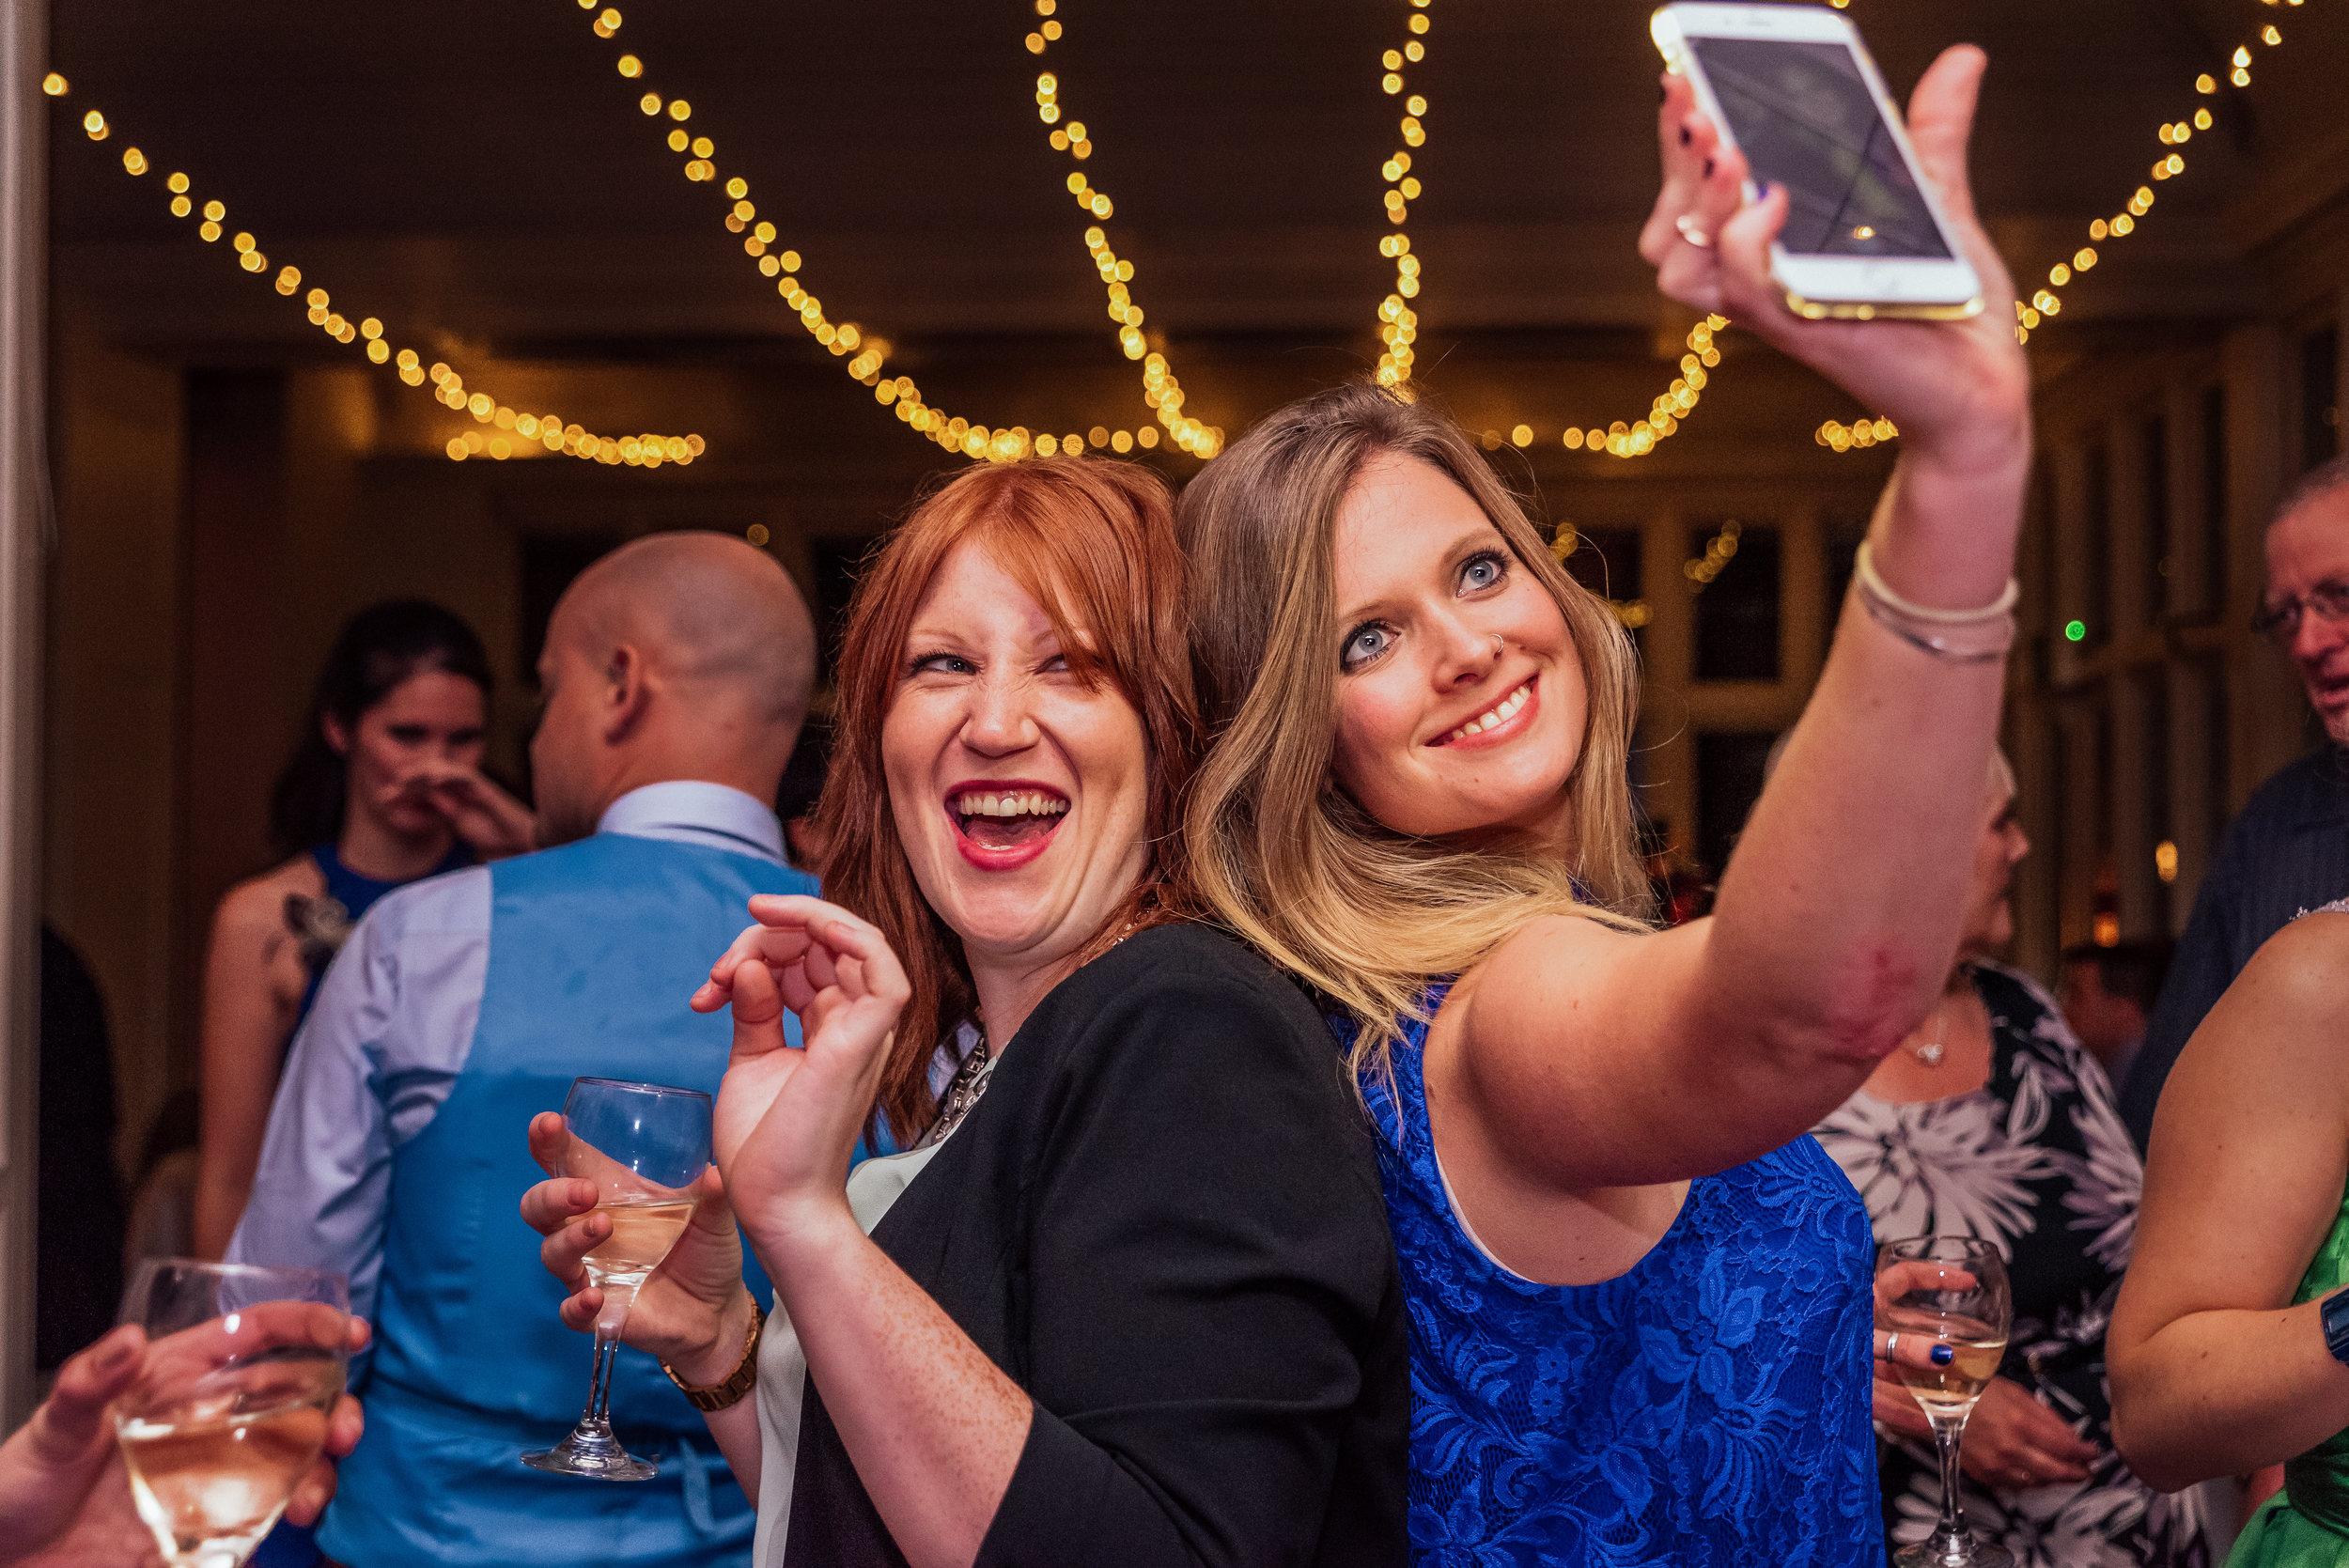 dace floor selfie - the elvetham wedding venue Hampshire - Amy James photography - documentary wedding photographer Hampshire